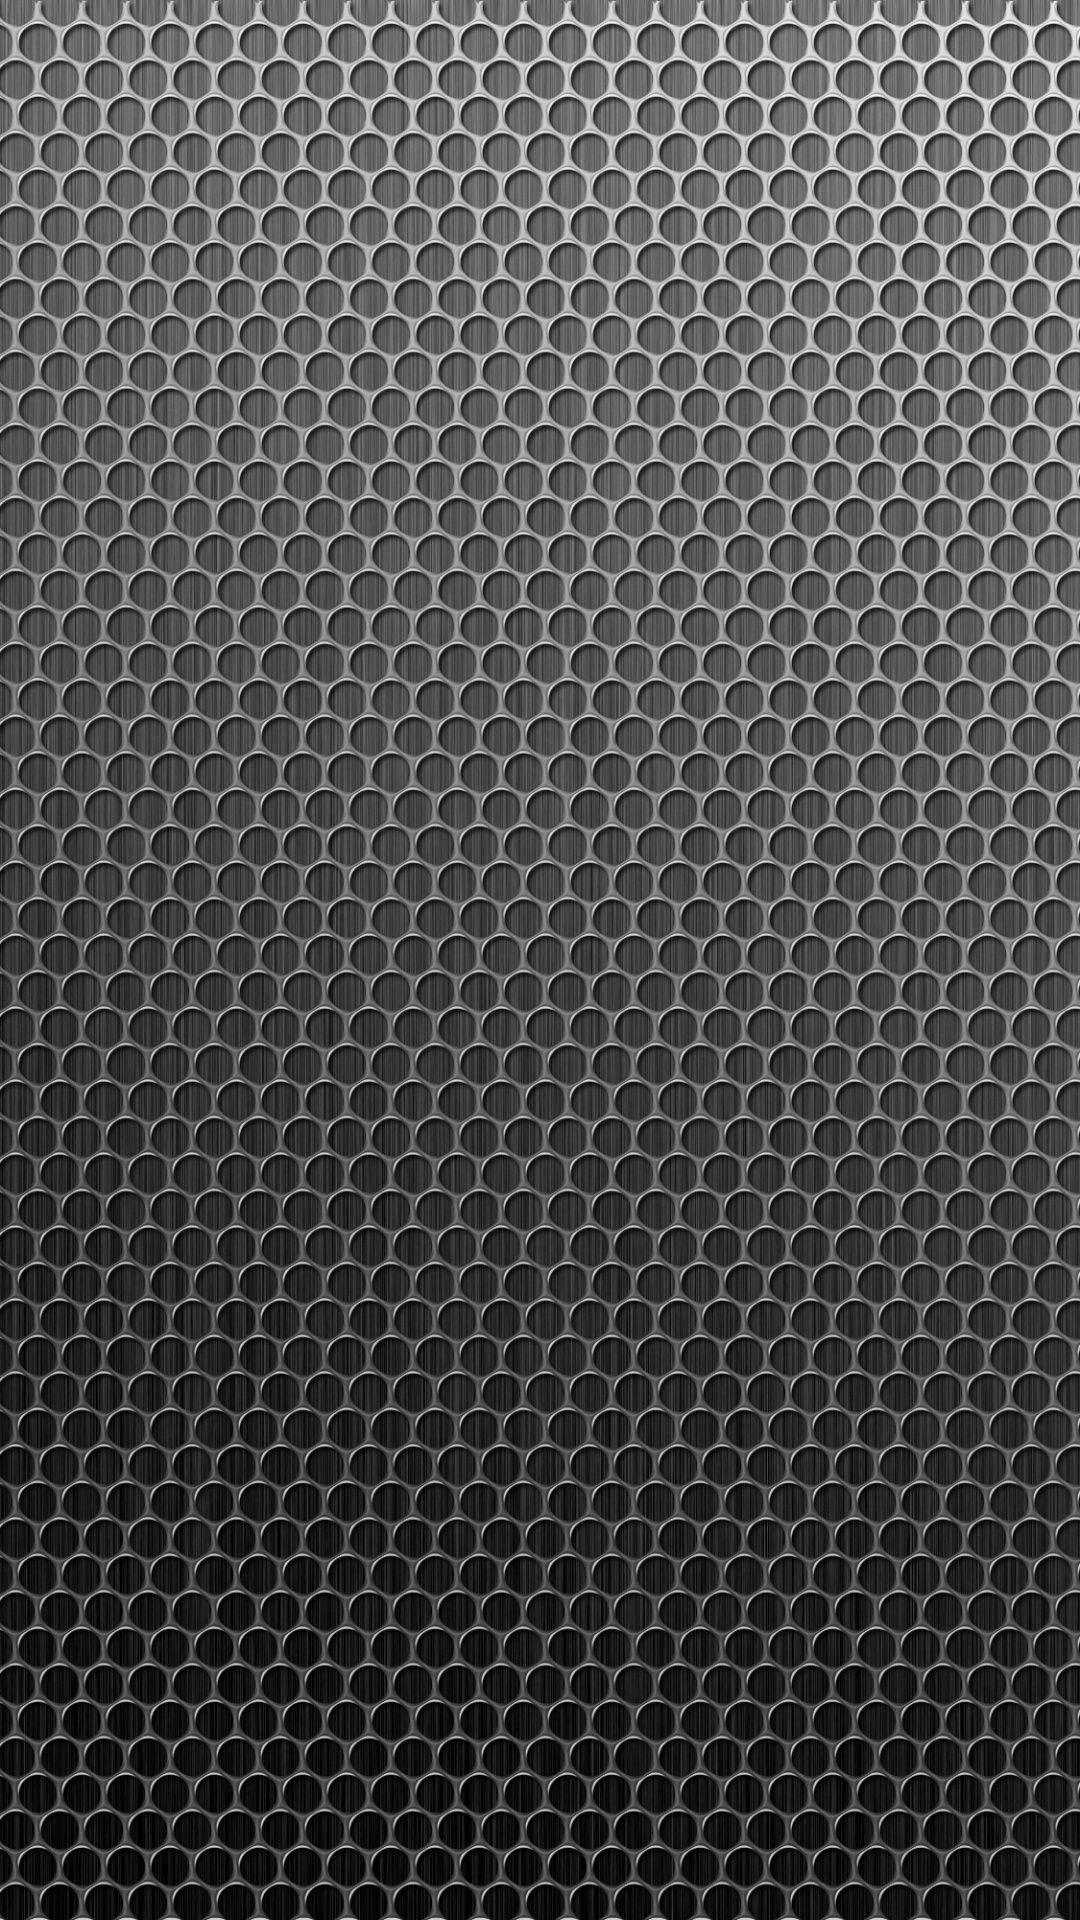 Download Wallpaper Monochrome, Line, Material, Texture, Vector